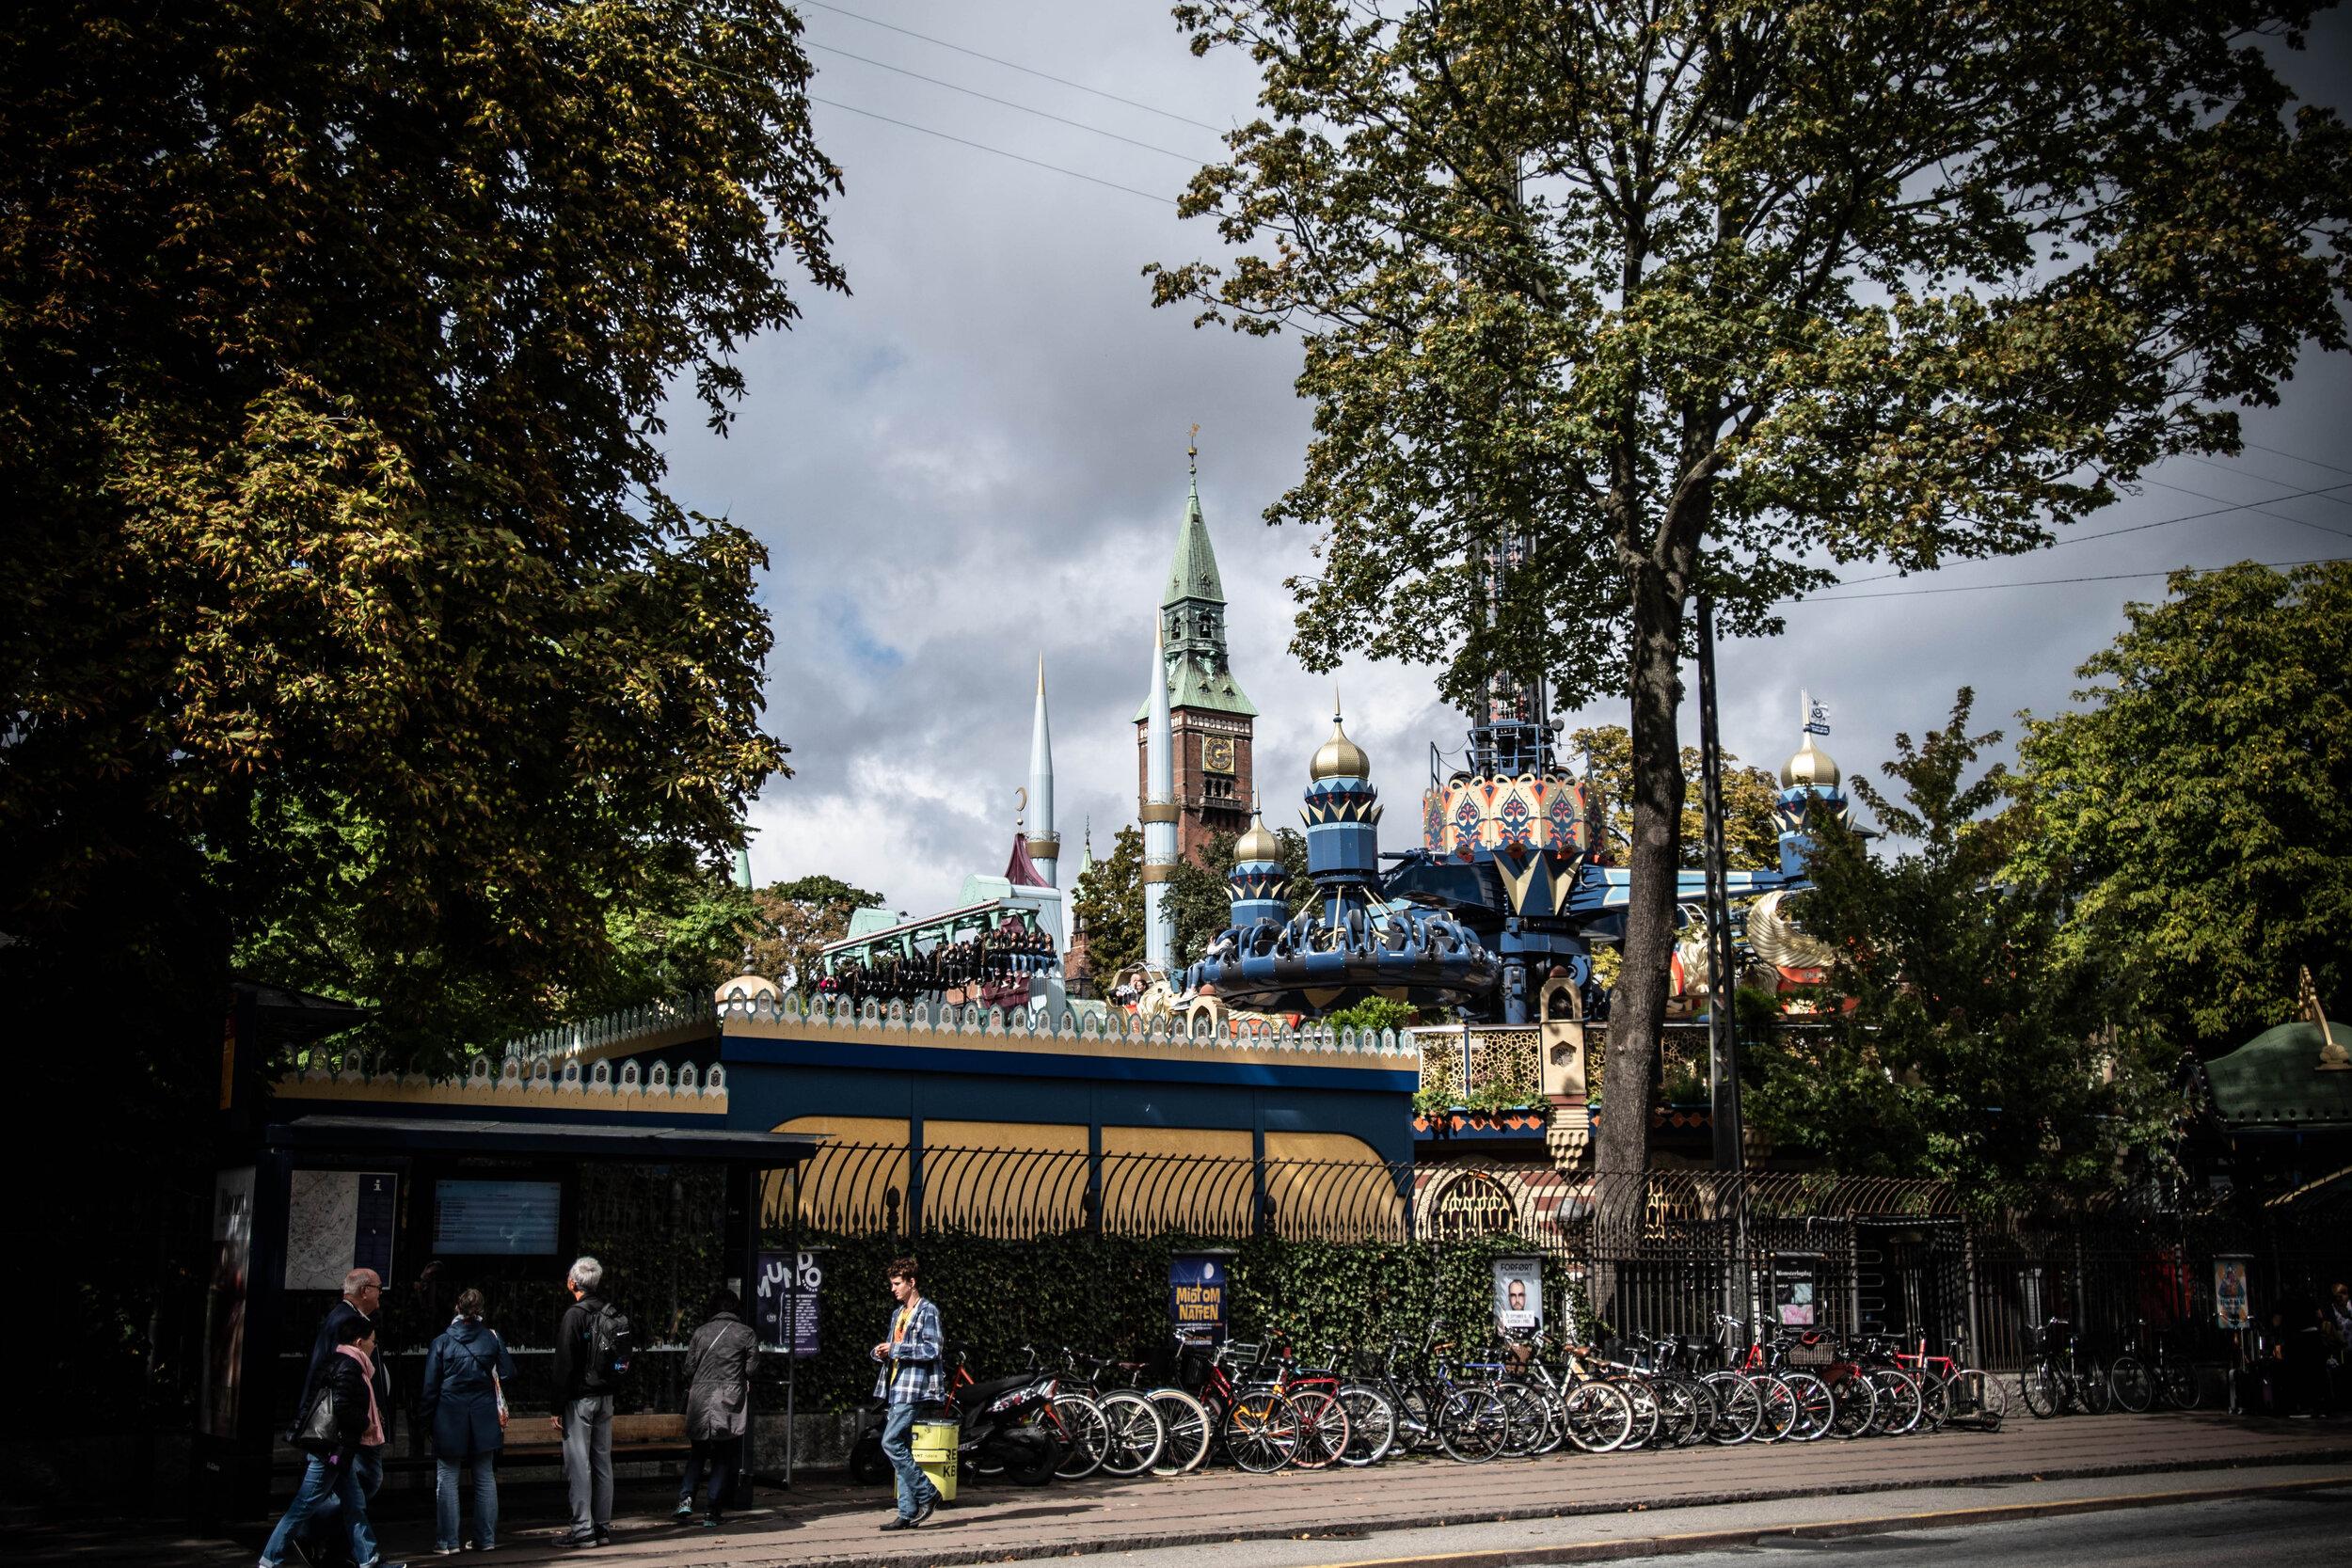 Ready for some amusement? Tivoli will take care of you while in Copenhagen.